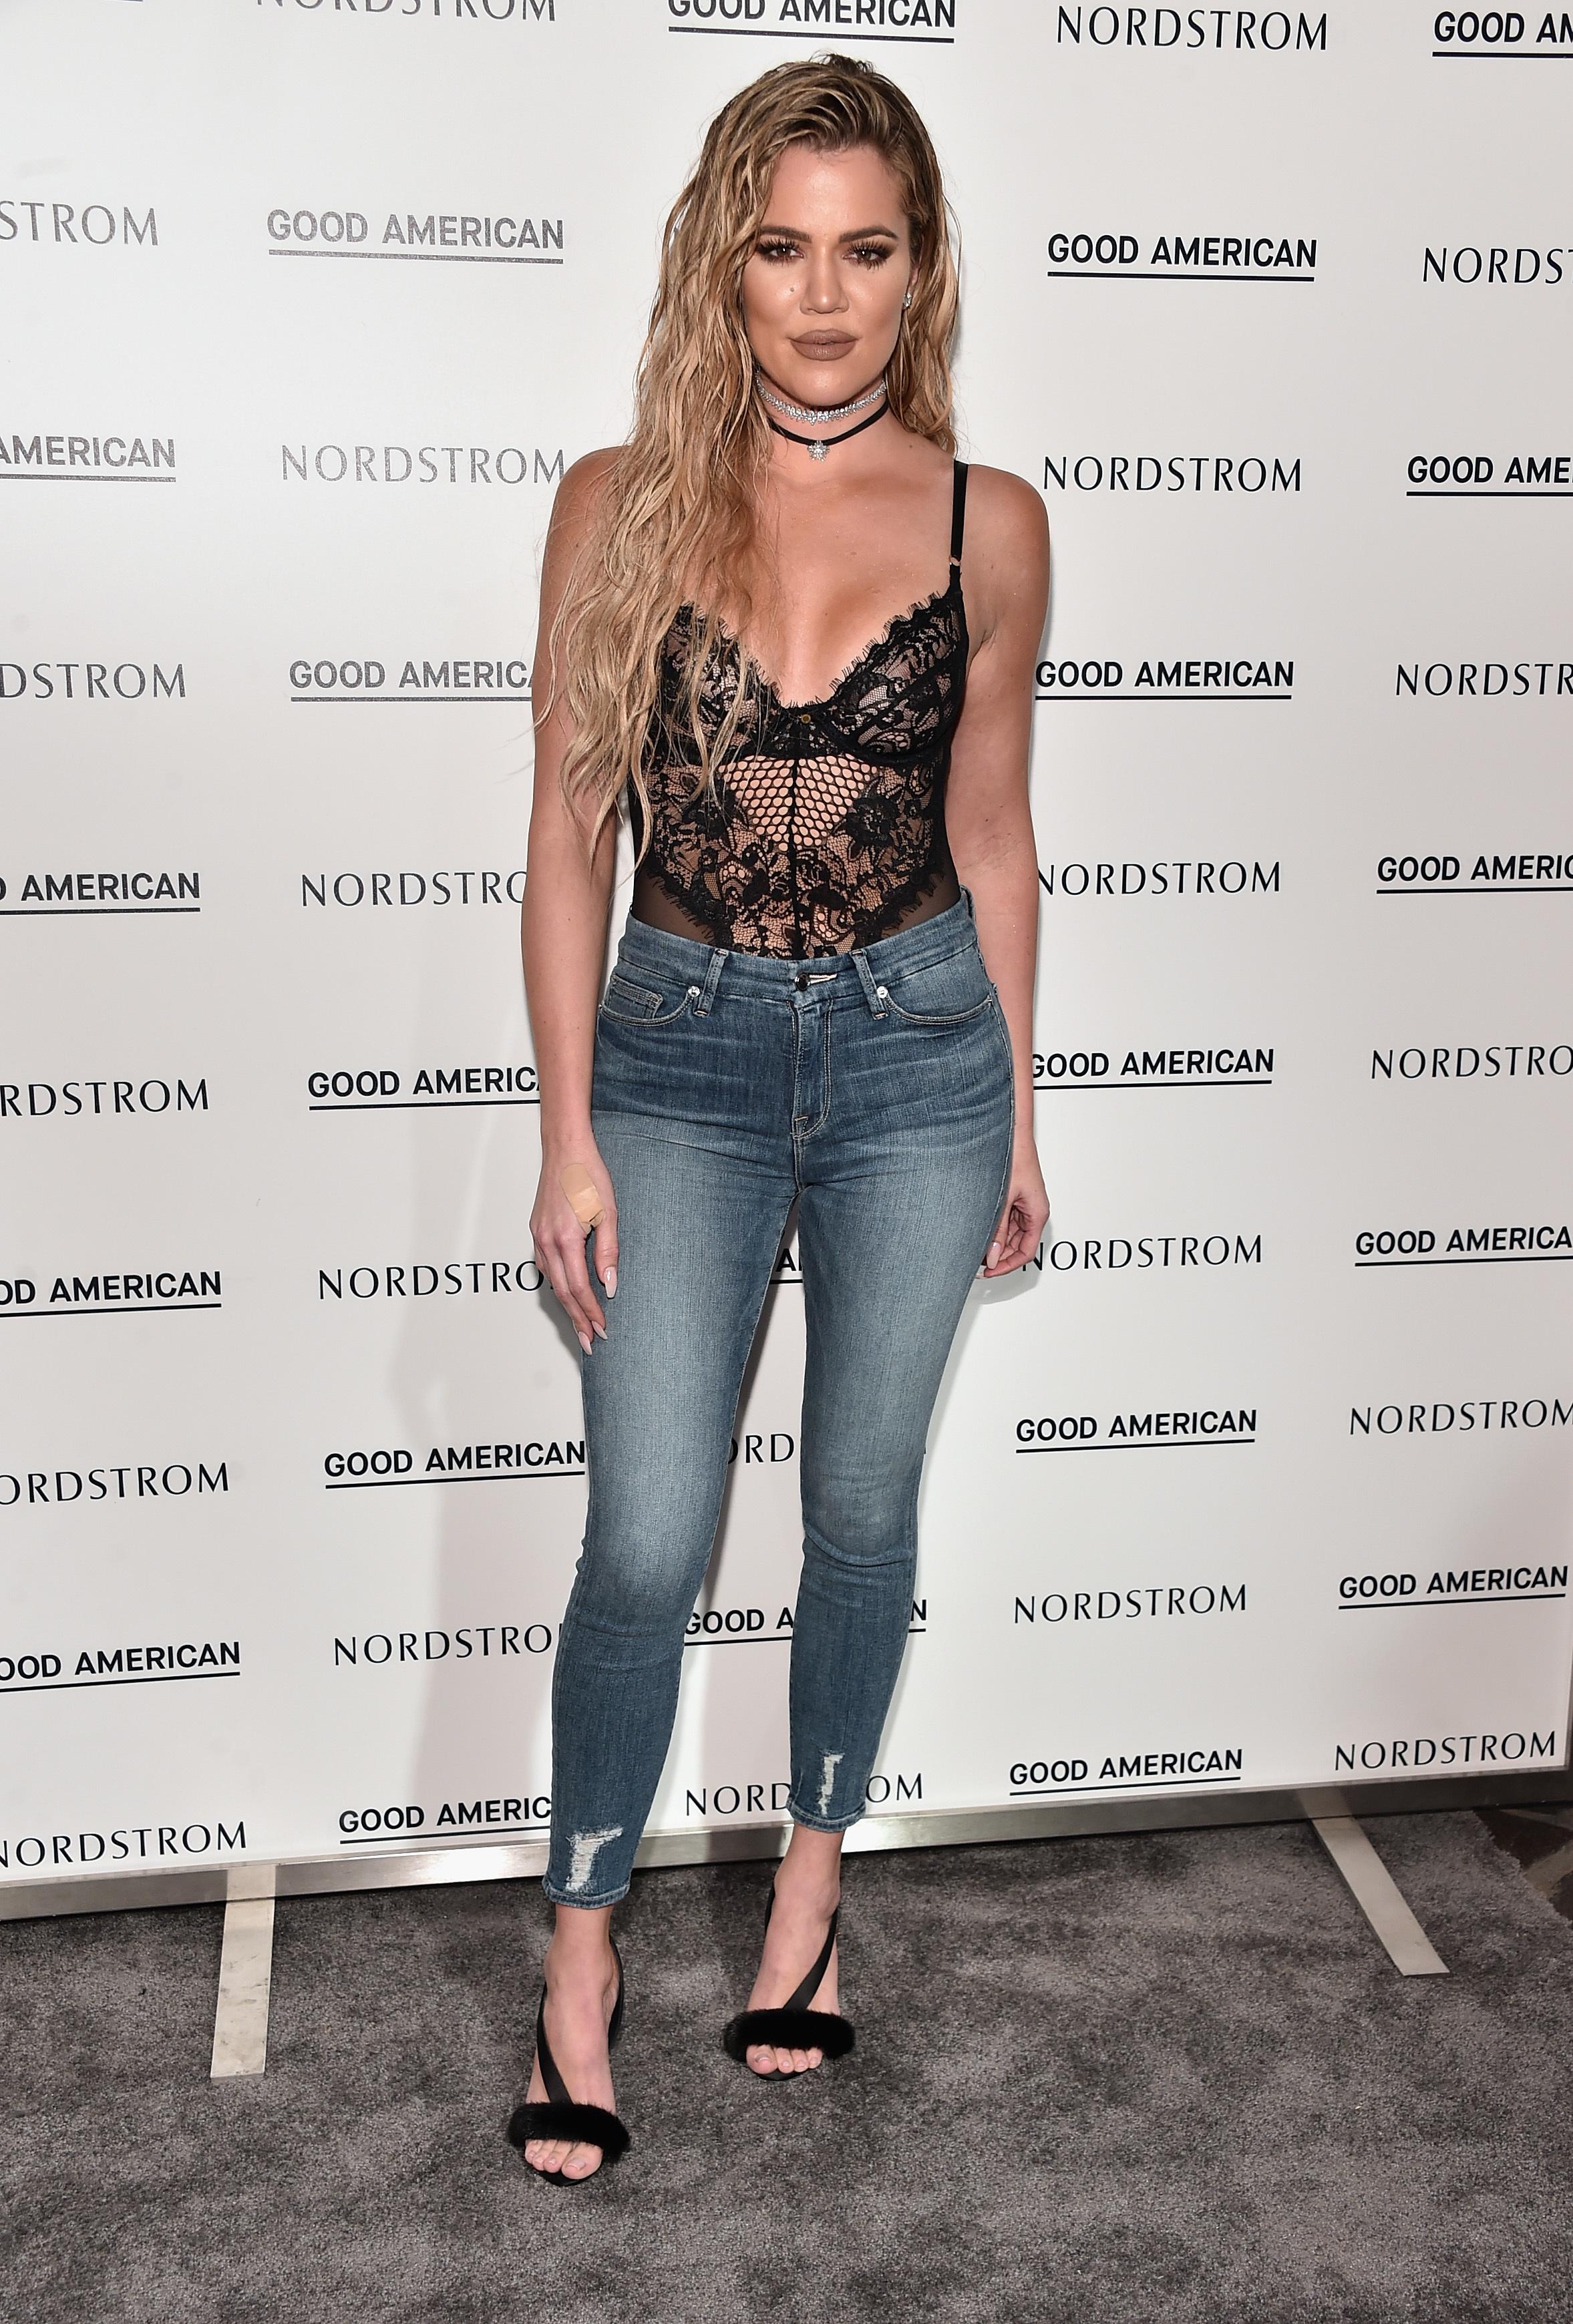 Khloe Kardashian's Good Waist jeans sell out again